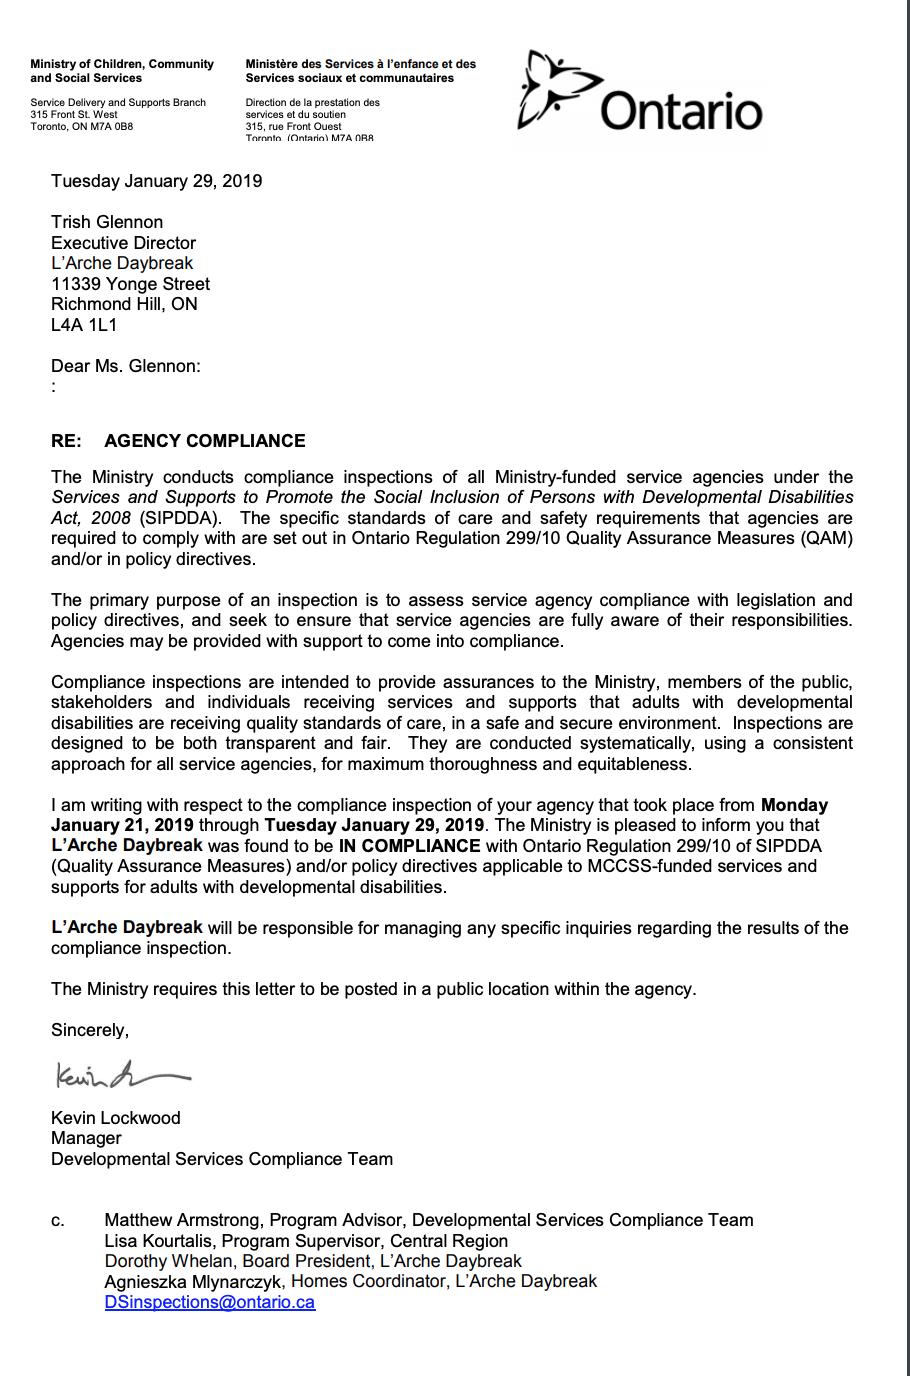 Community Service Confirmation Letter from larchedaybreak.com